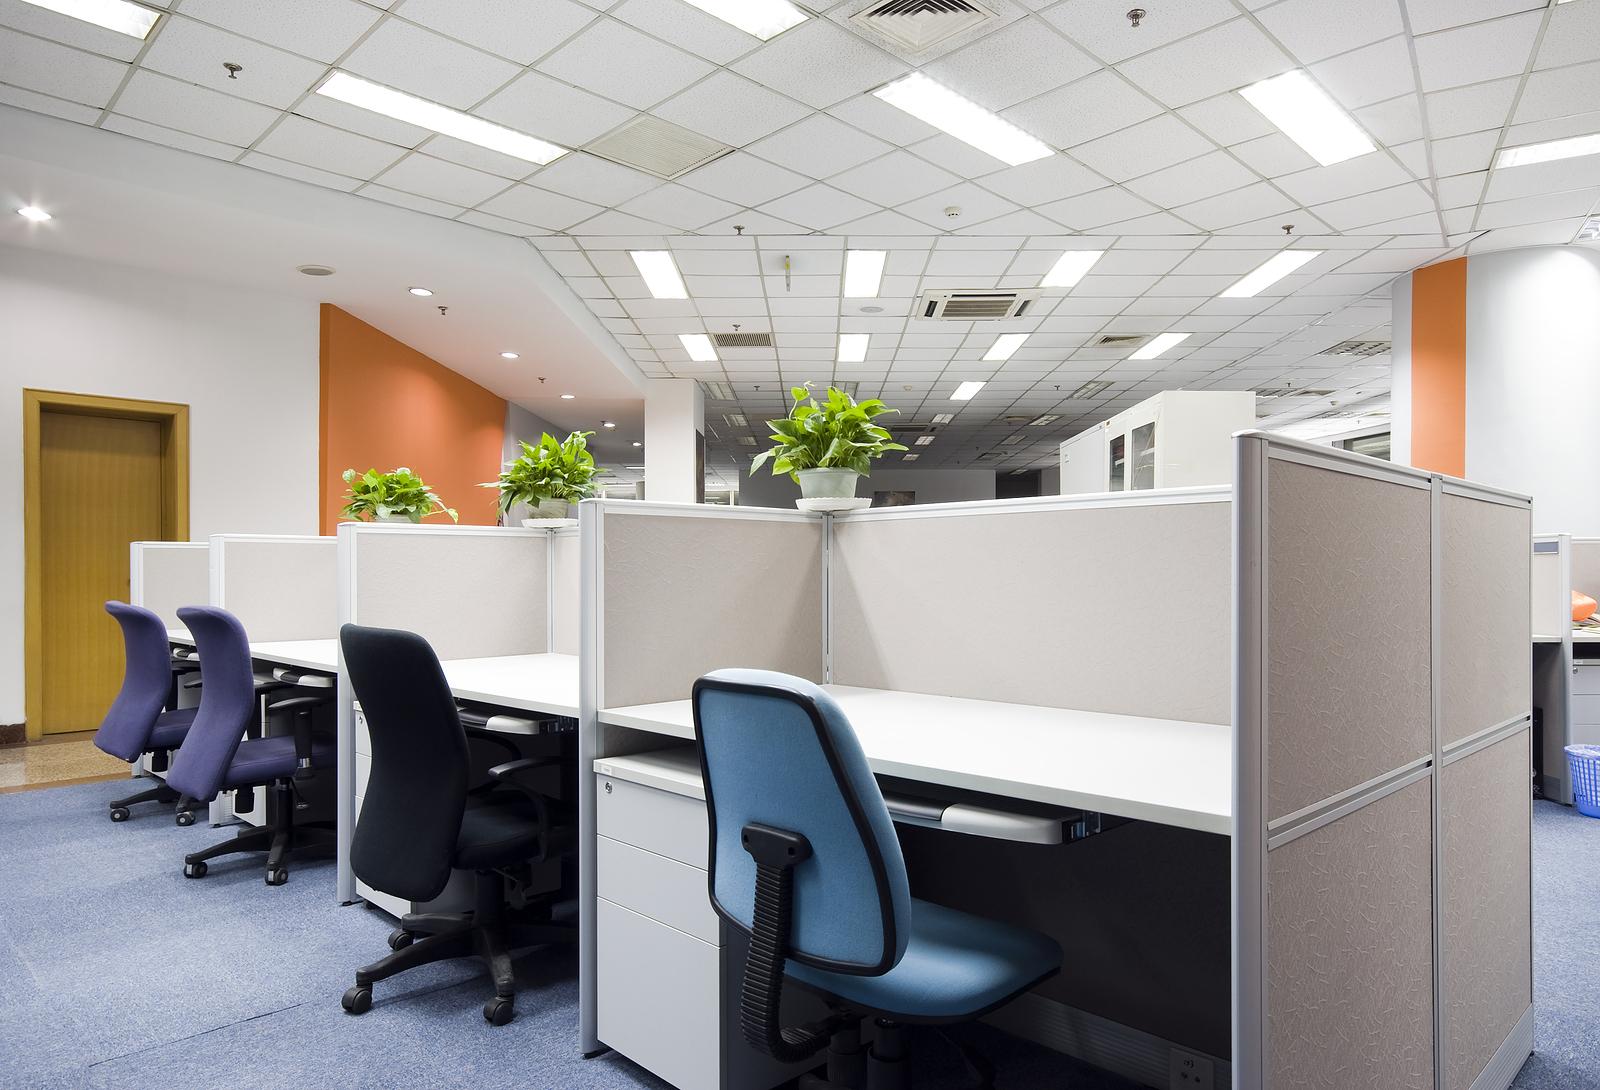 office-cleaning-kansas-city-checklist.jpg